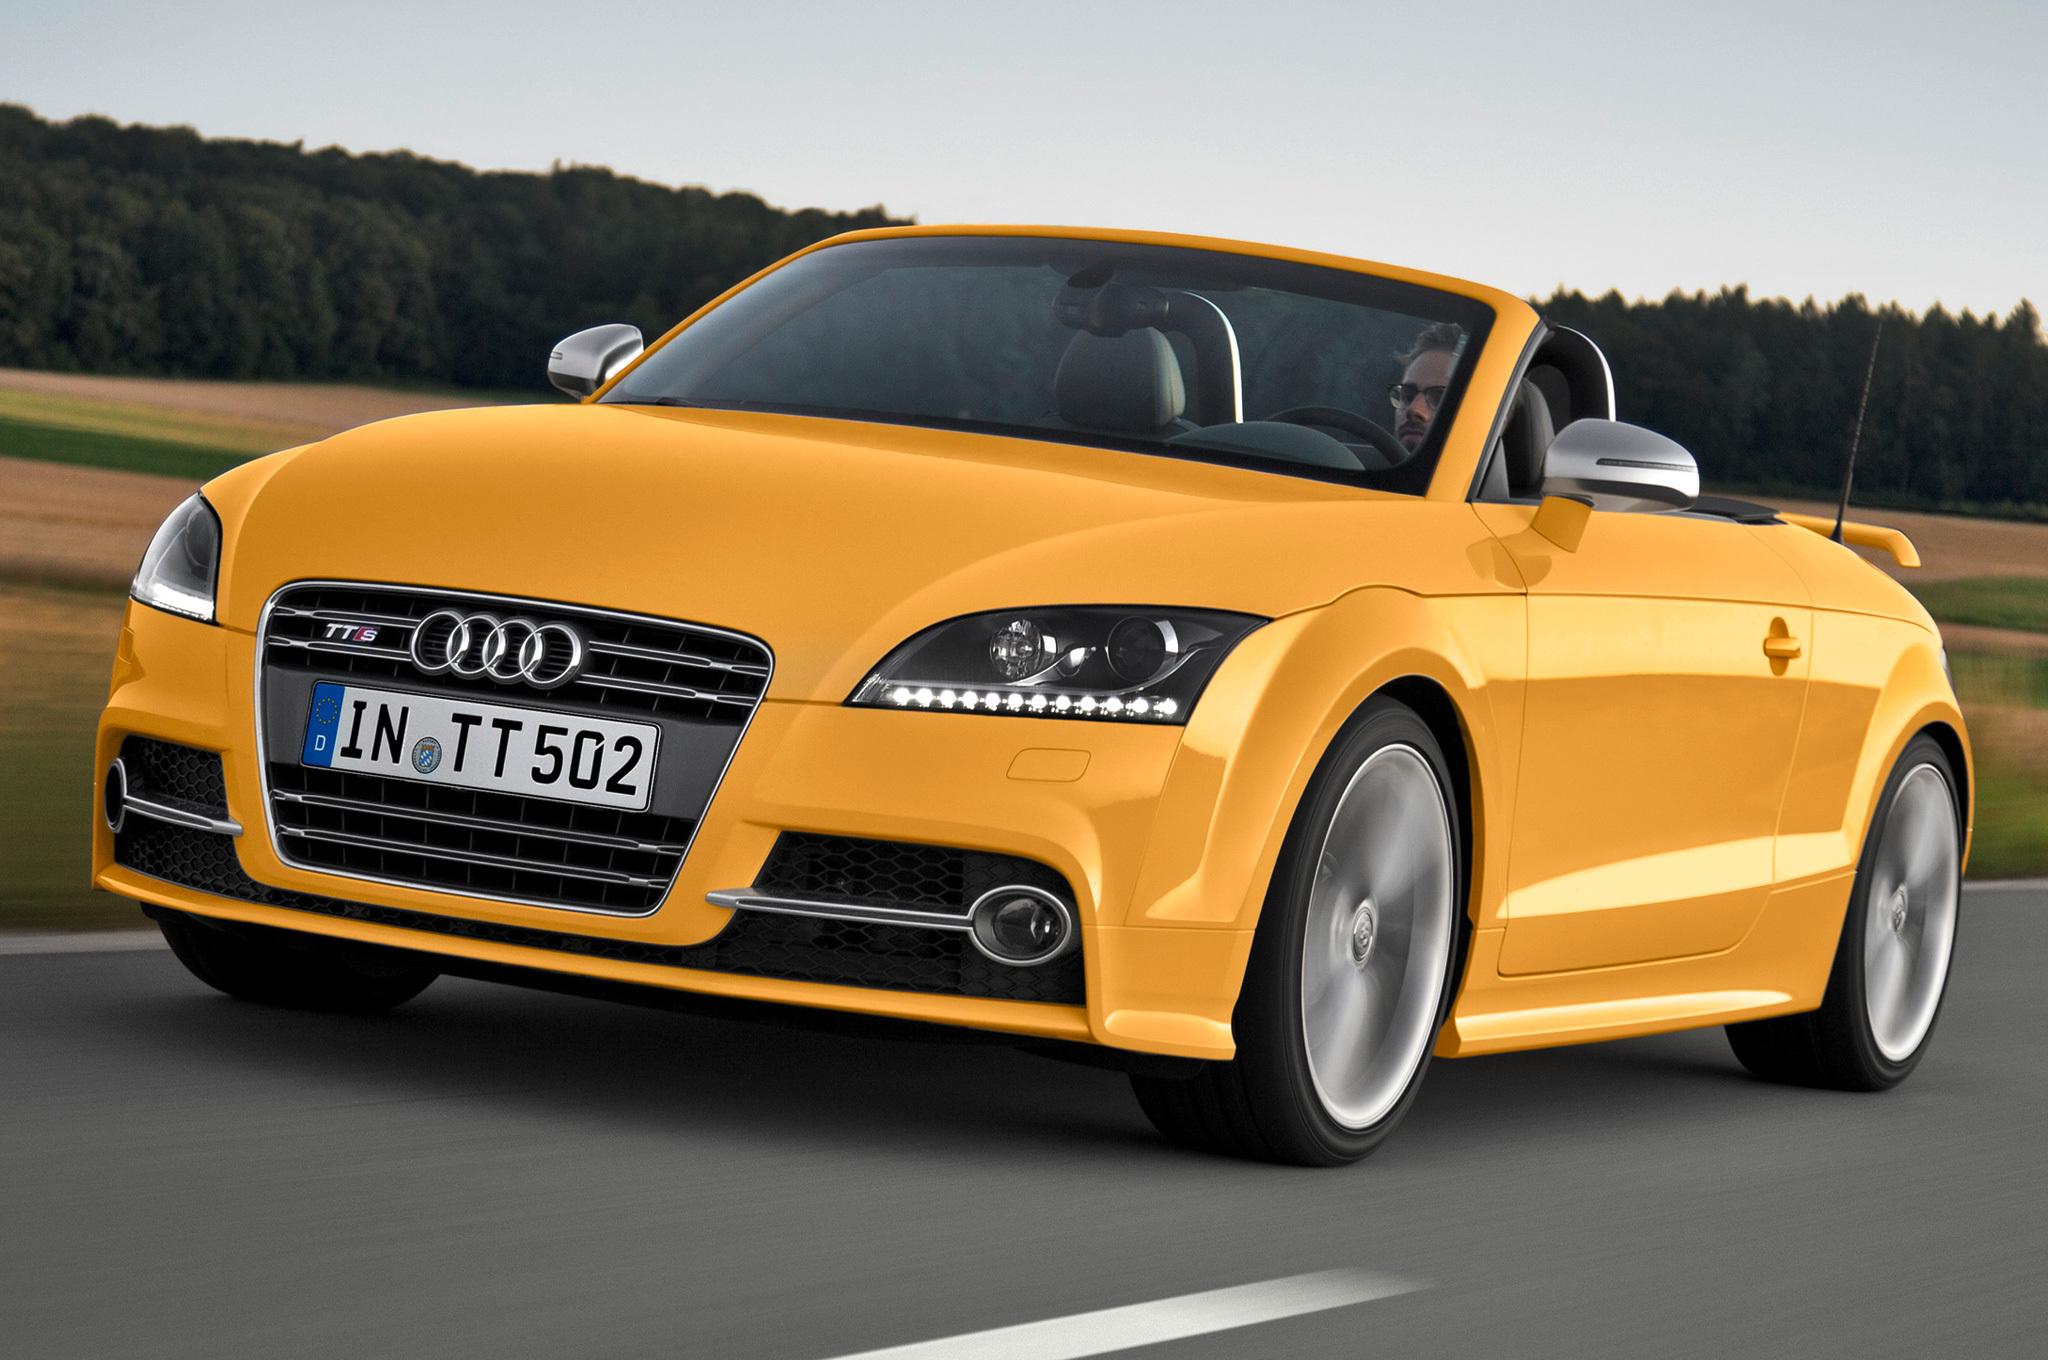 Car Brand Audi TT Models Wallpapers And Images Wallpapers - Audi car new model